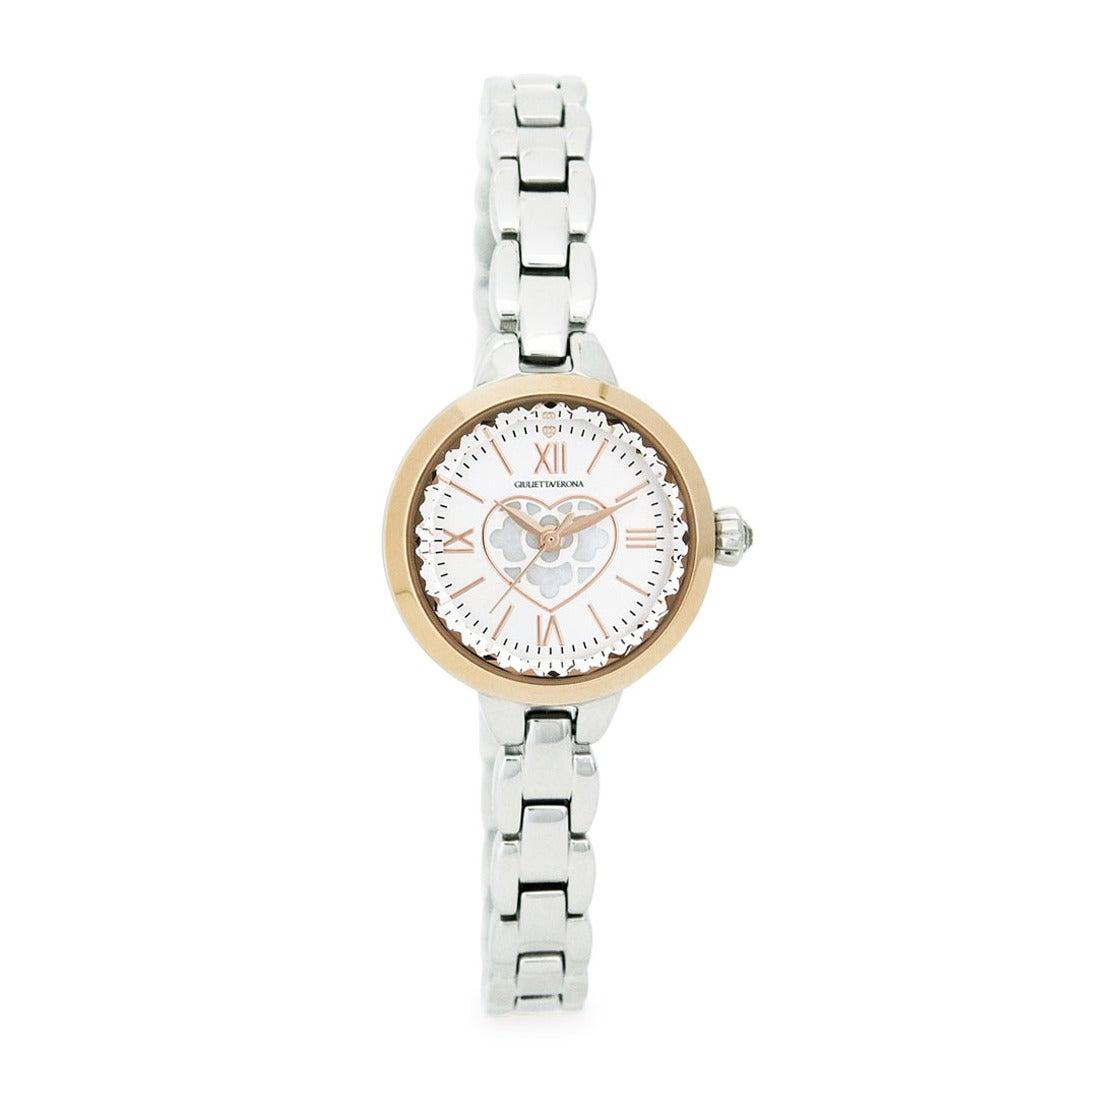 【SAC'S BAR】ジュリエッタヴェローナ GIULIETTAVERONA 腕時計 GV004T PURE GIULIETTA シルバー×シルバー